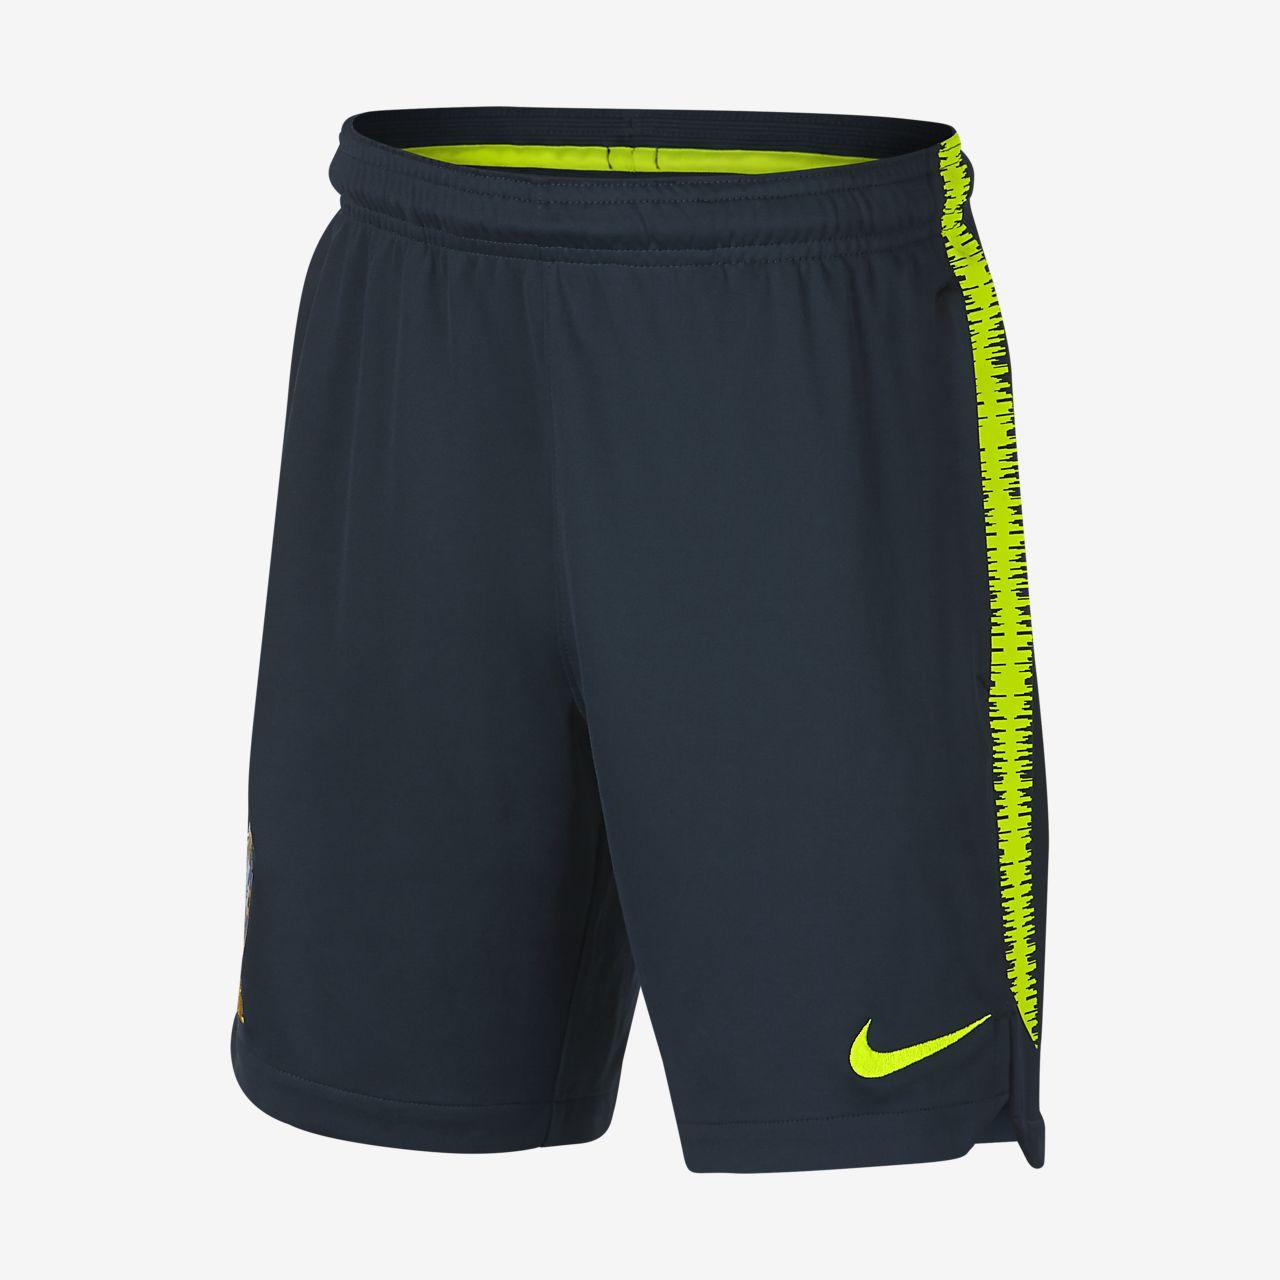 Brasil CBF Dri-FIT Squad Pantalons curts de futbol - Nen/a